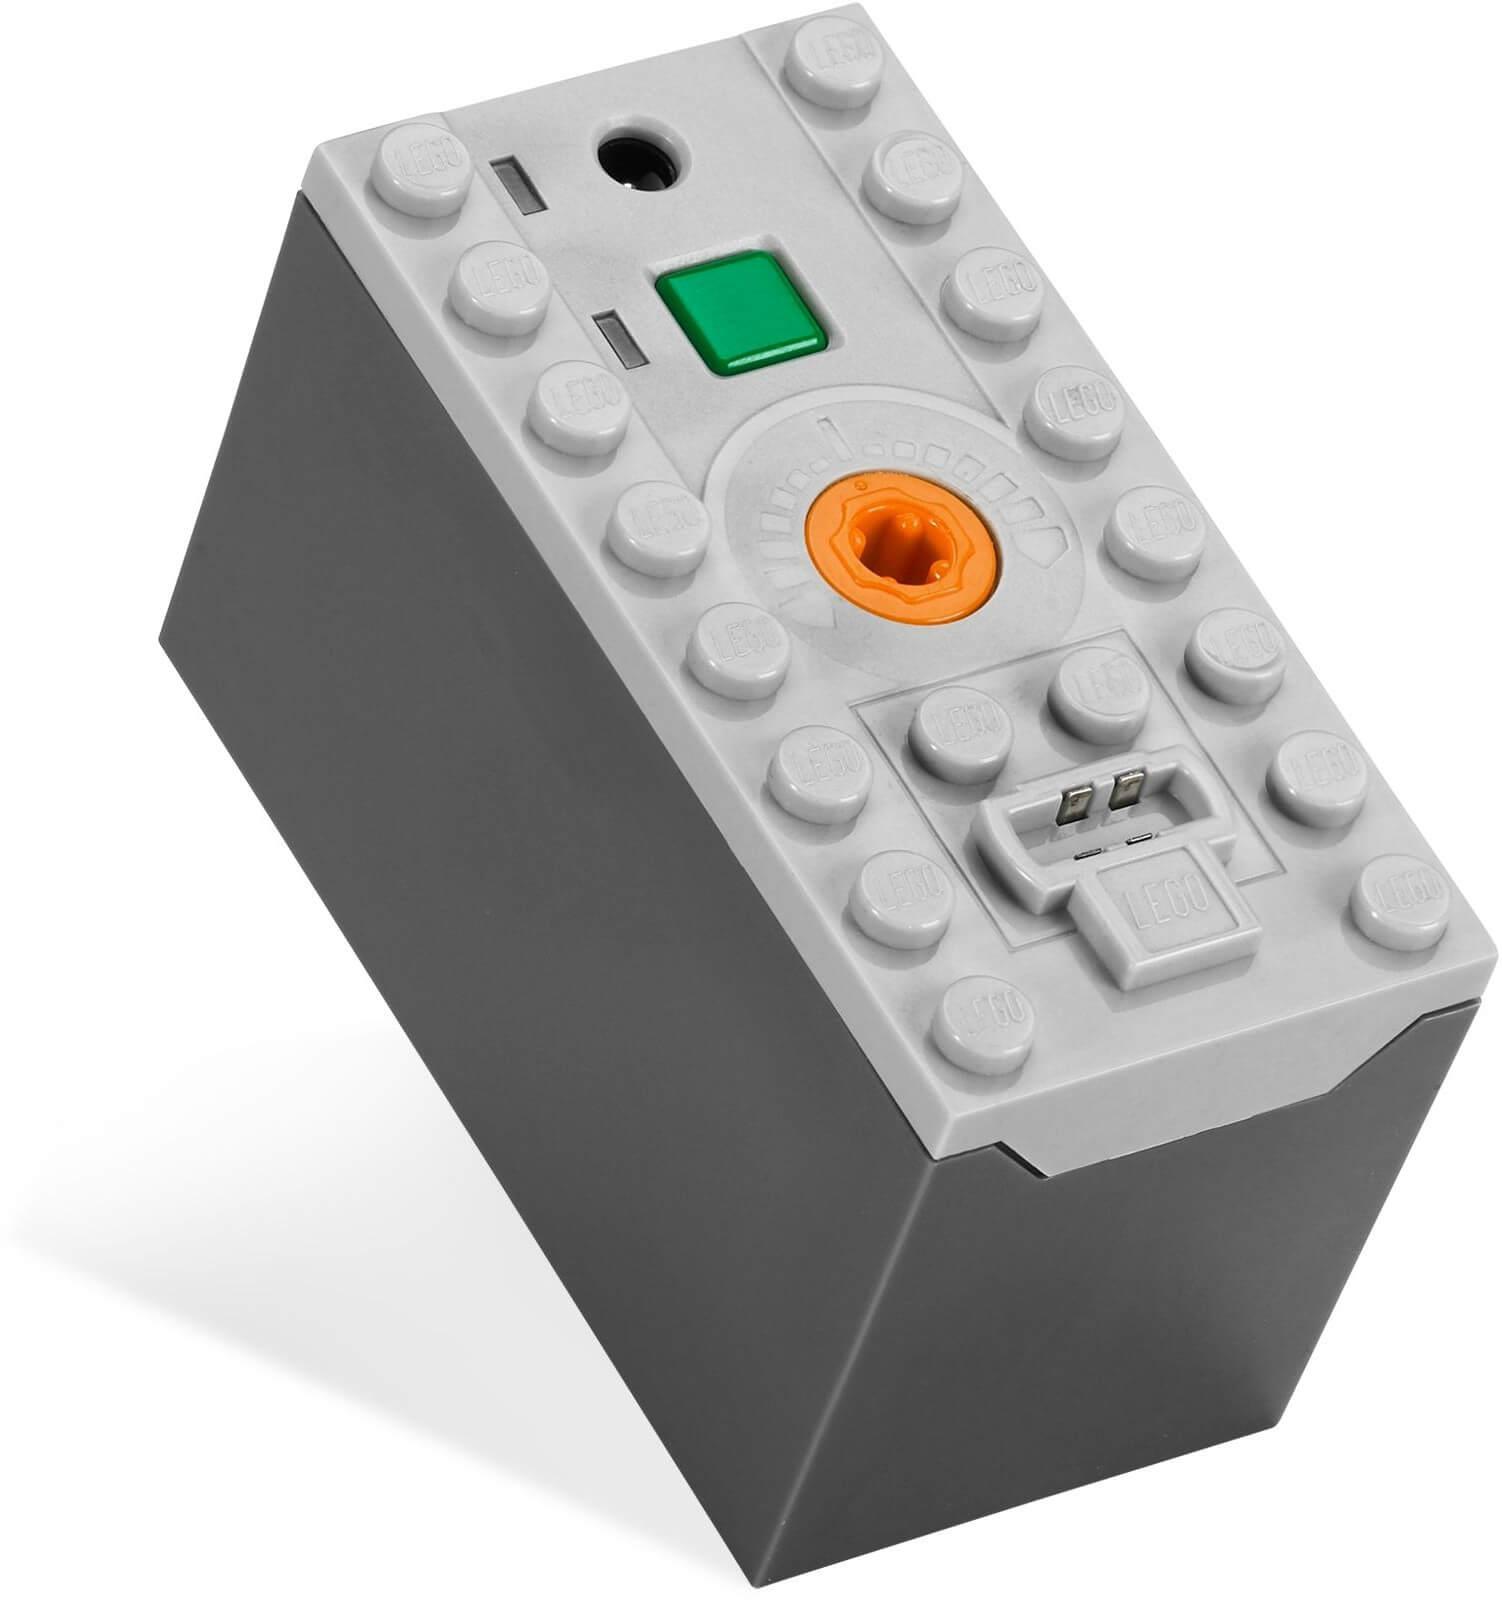 Mua đồ chơi LEGO 8878 - LEGO Power Functions 8878 - Bộ pin sạc (LEGO Power Functions Rechargeable Battery Box 8878)